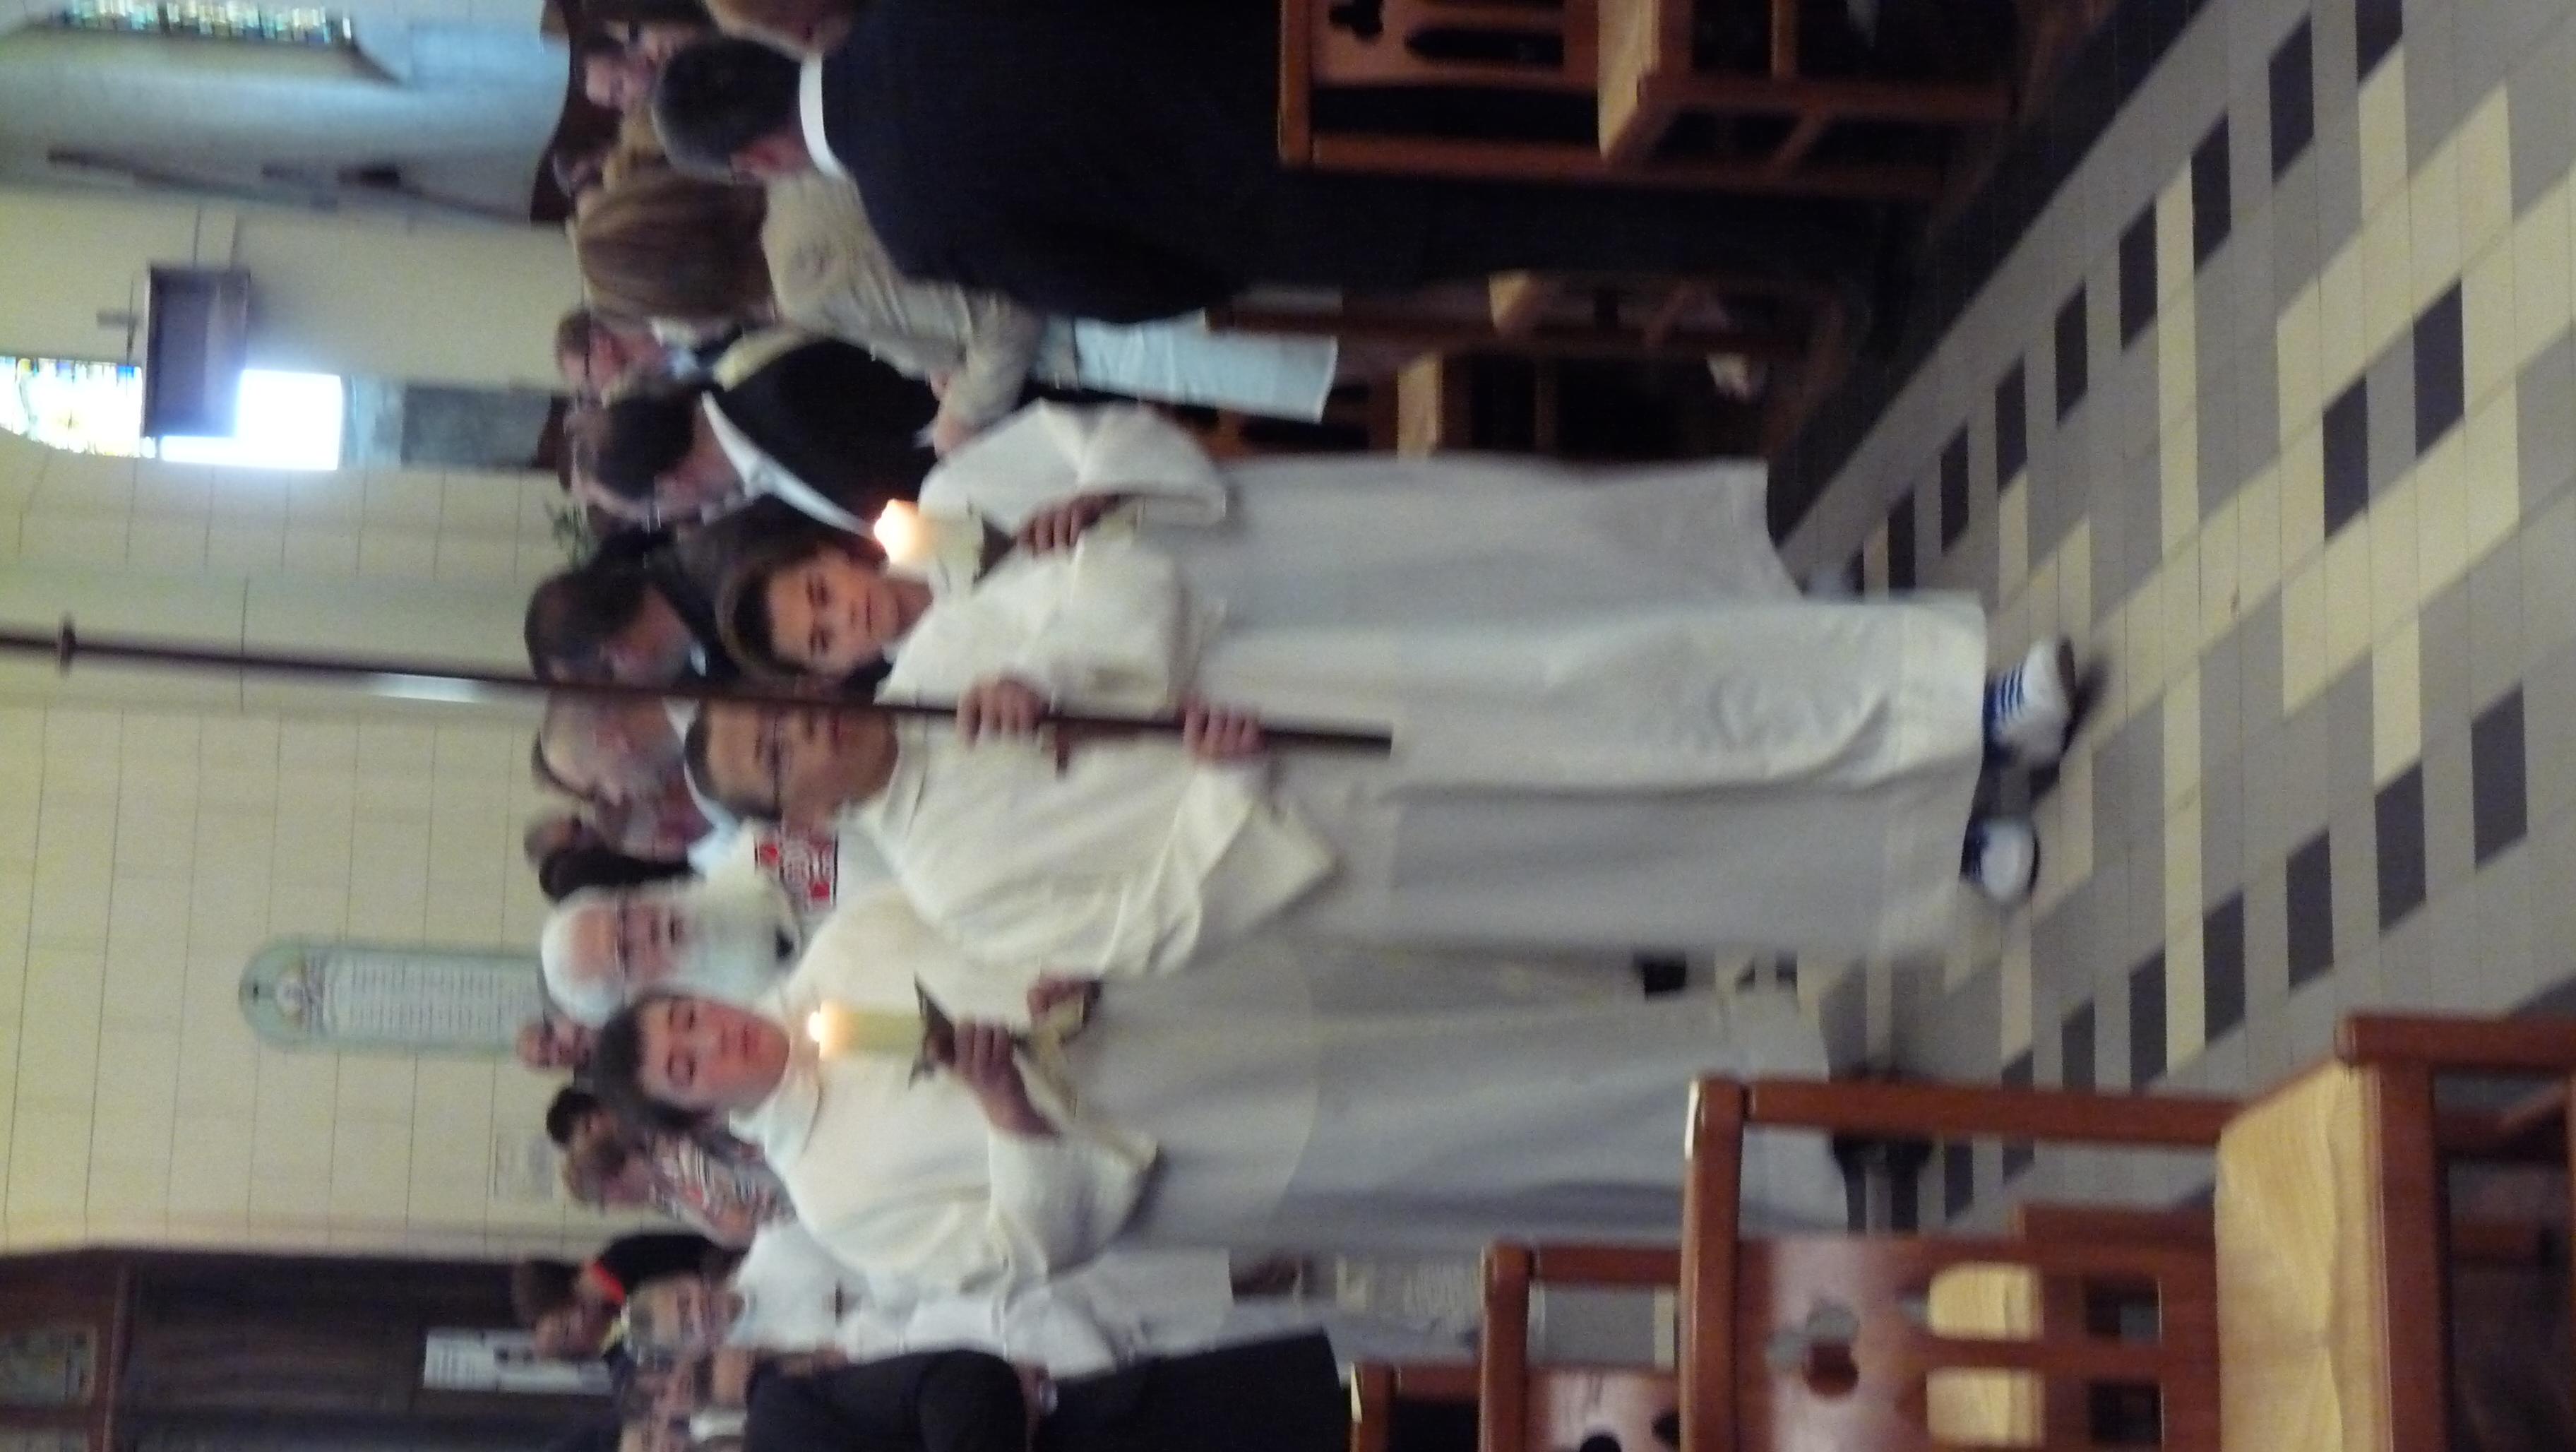 communion solennelle villers guislain 2 juin 2013